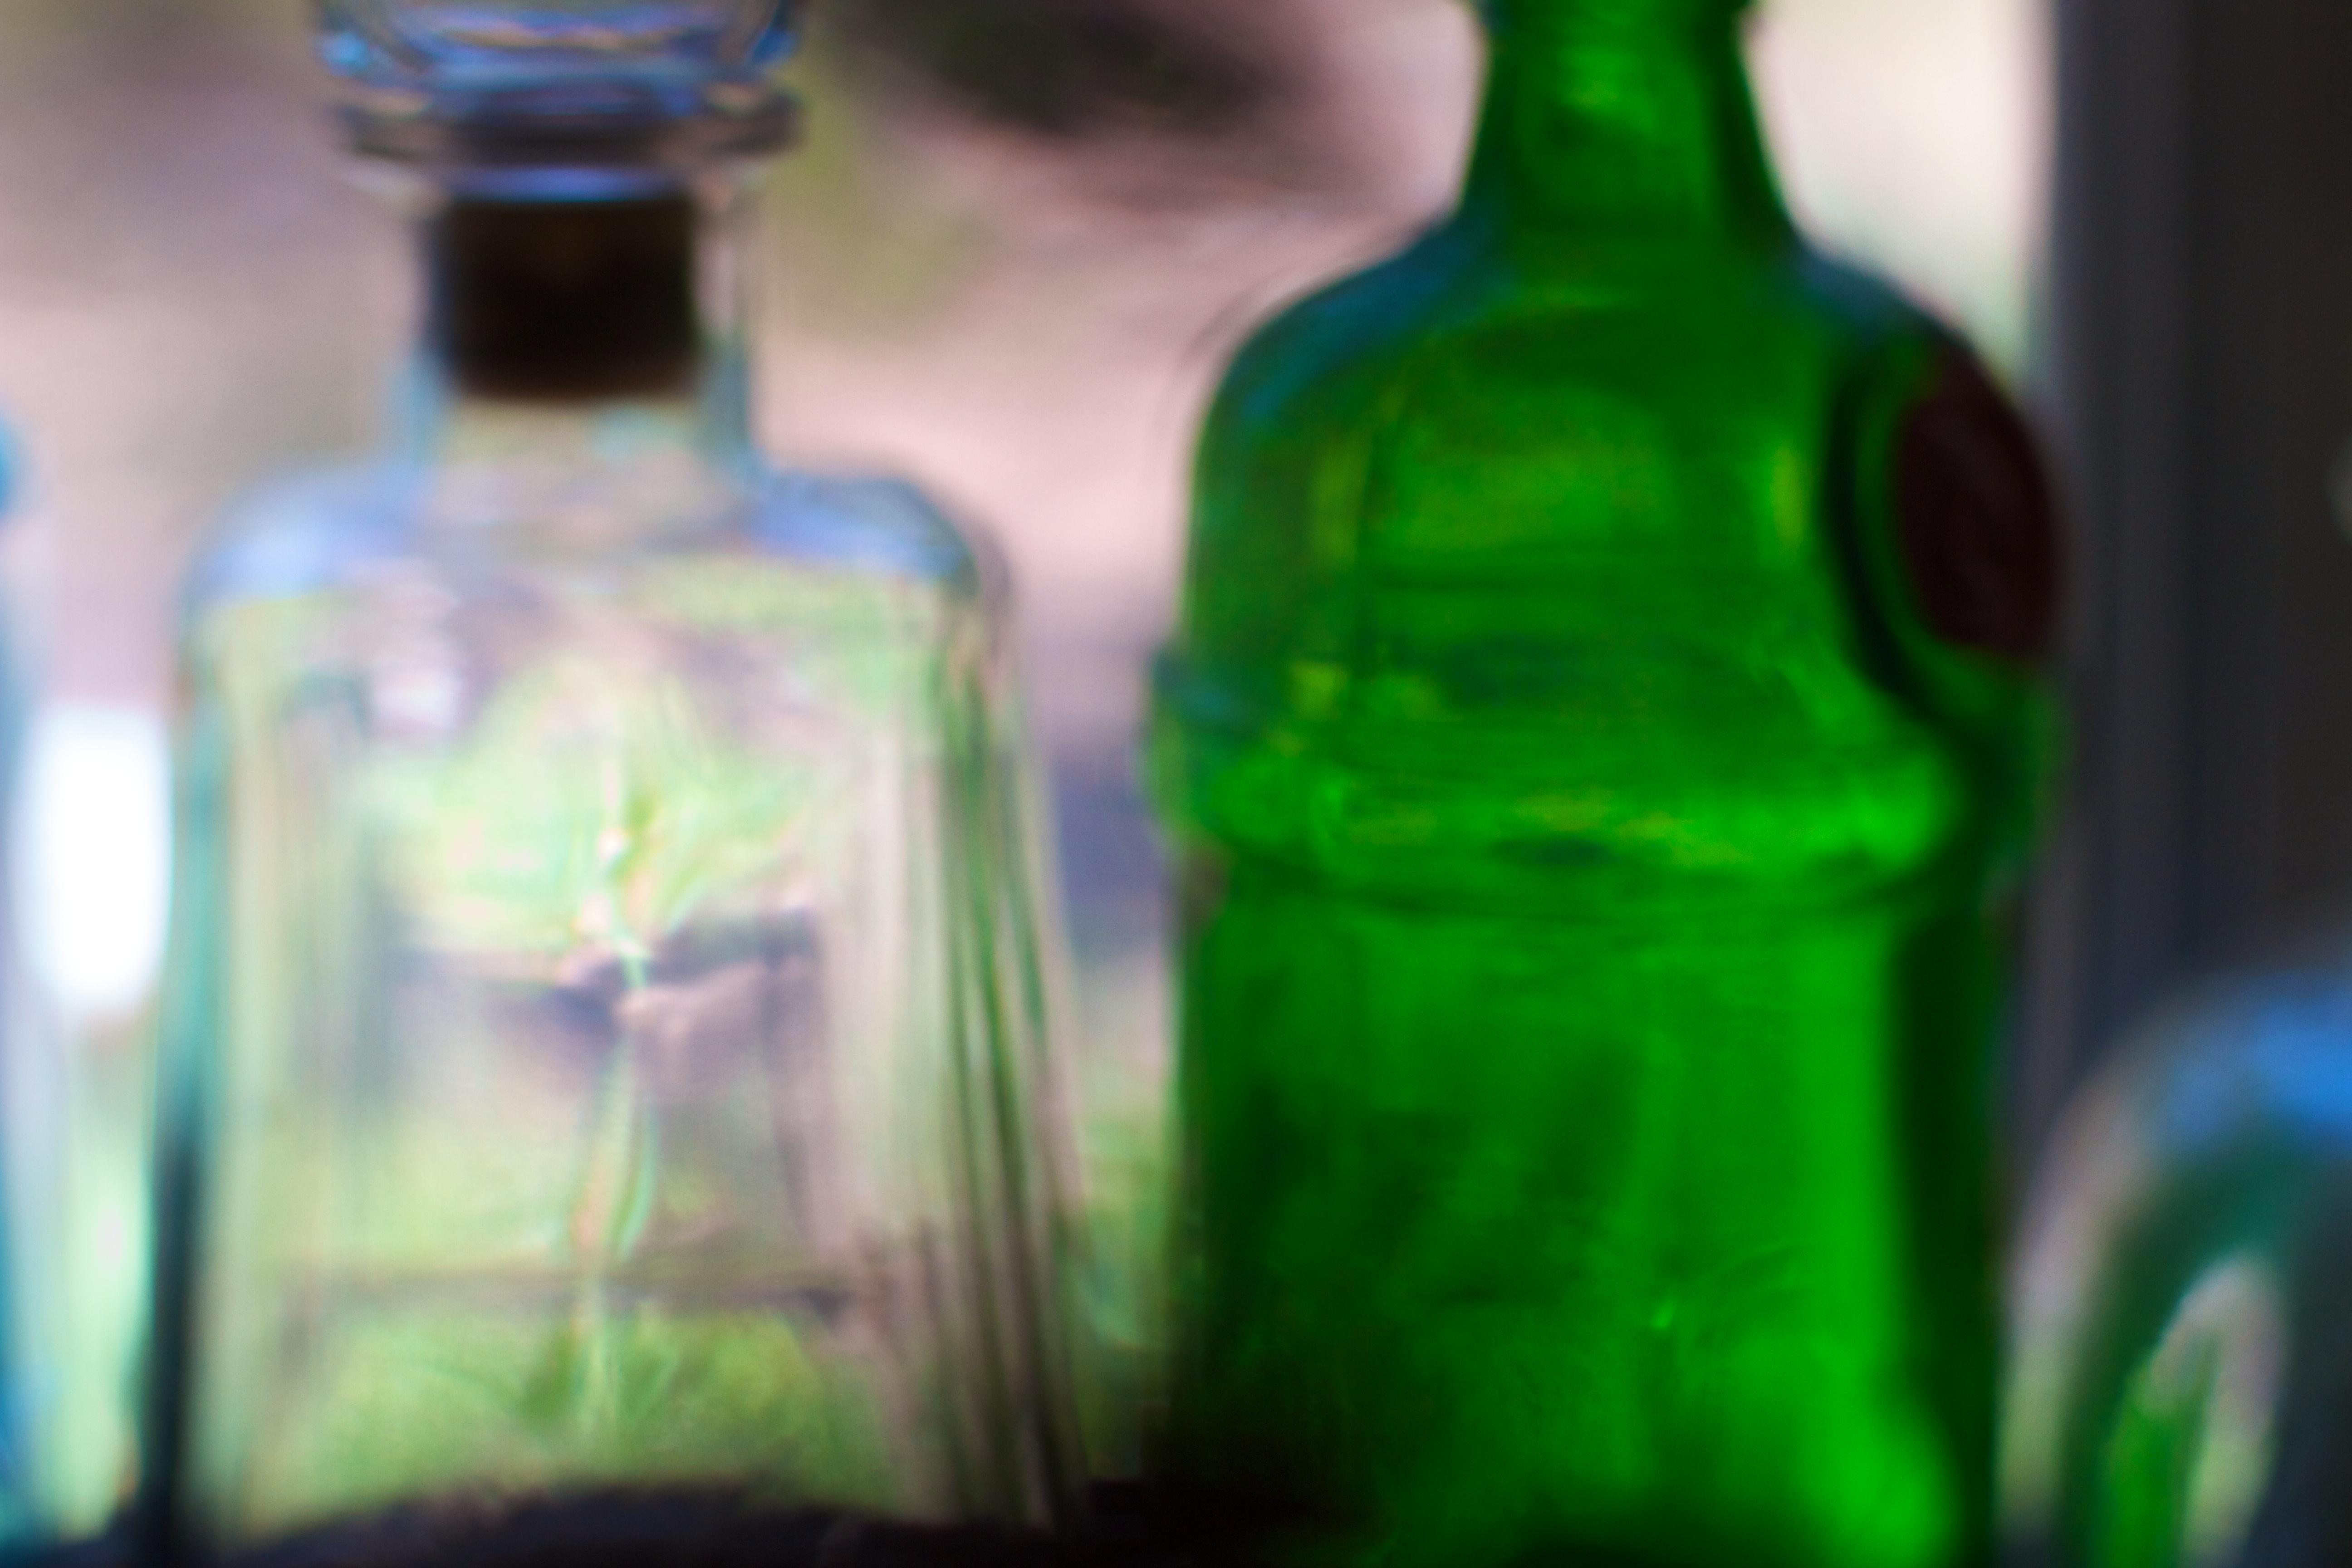 Free Images : green, drink, alcohol, wine bottle, glass bottle ...